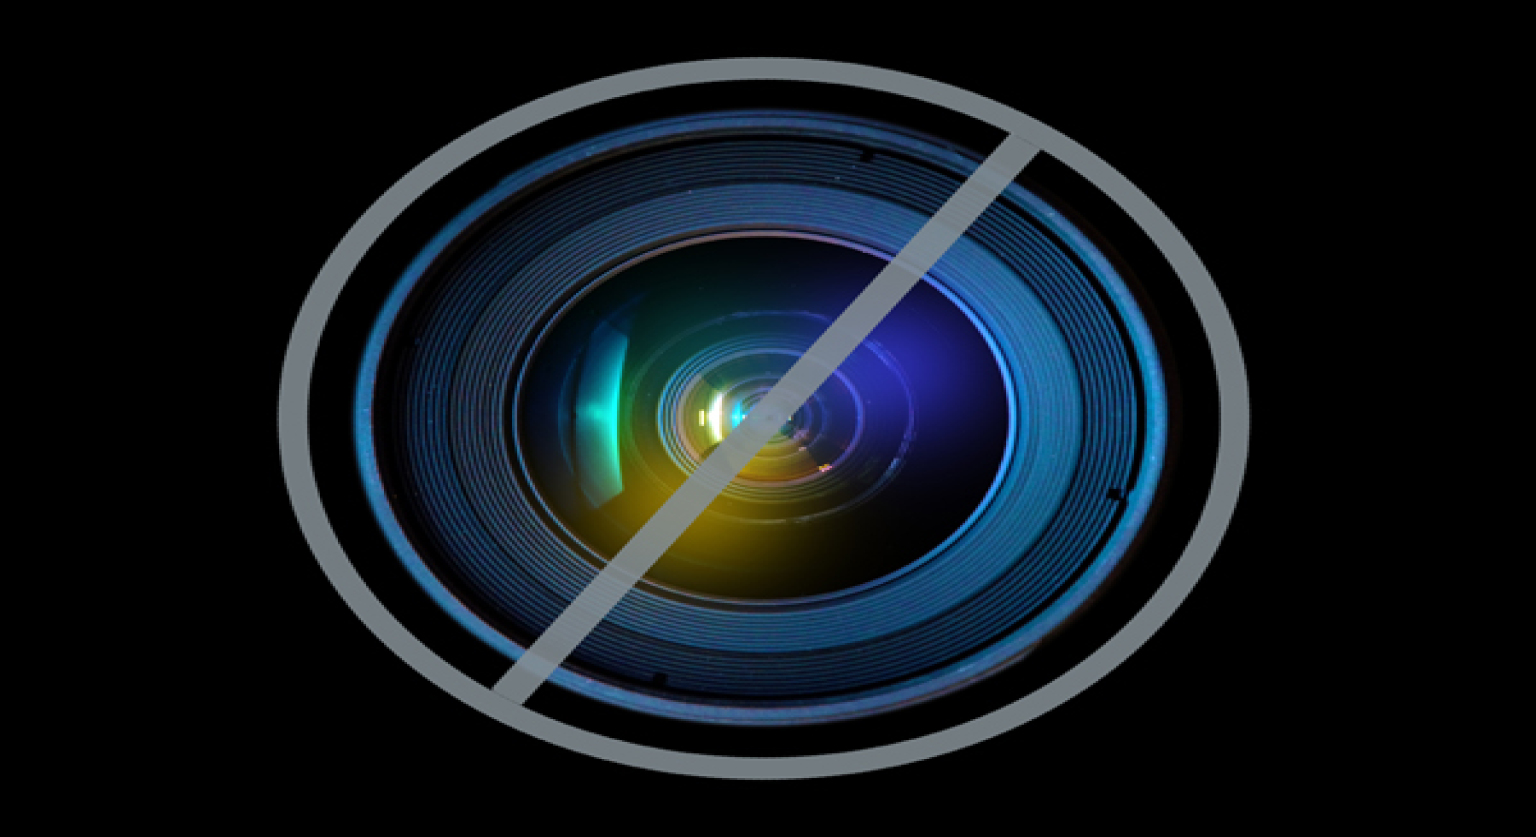 http://i.huffpost.com/gen/1373310/thumbs/o-PINK-STAR-DIAMOND-facebook.jpg